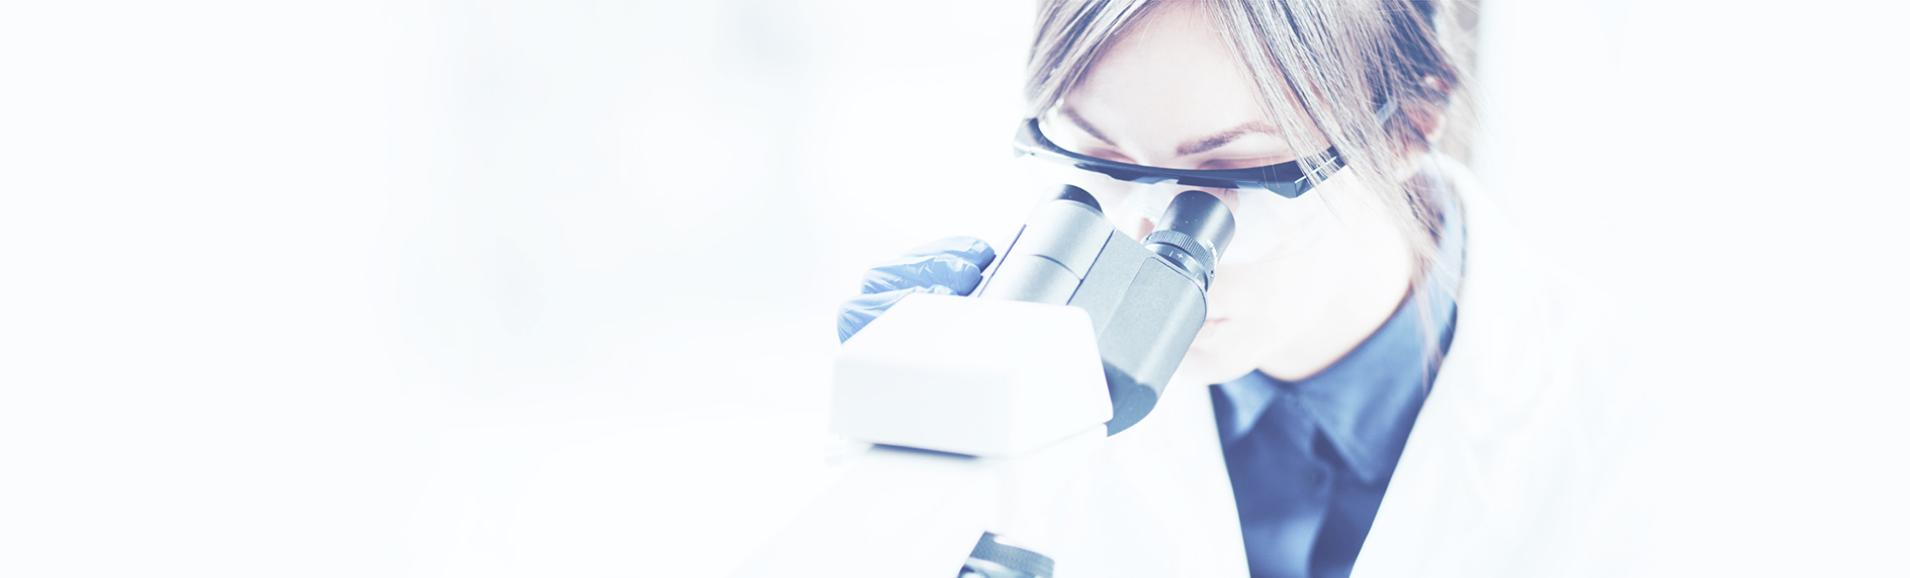 working doctor photo